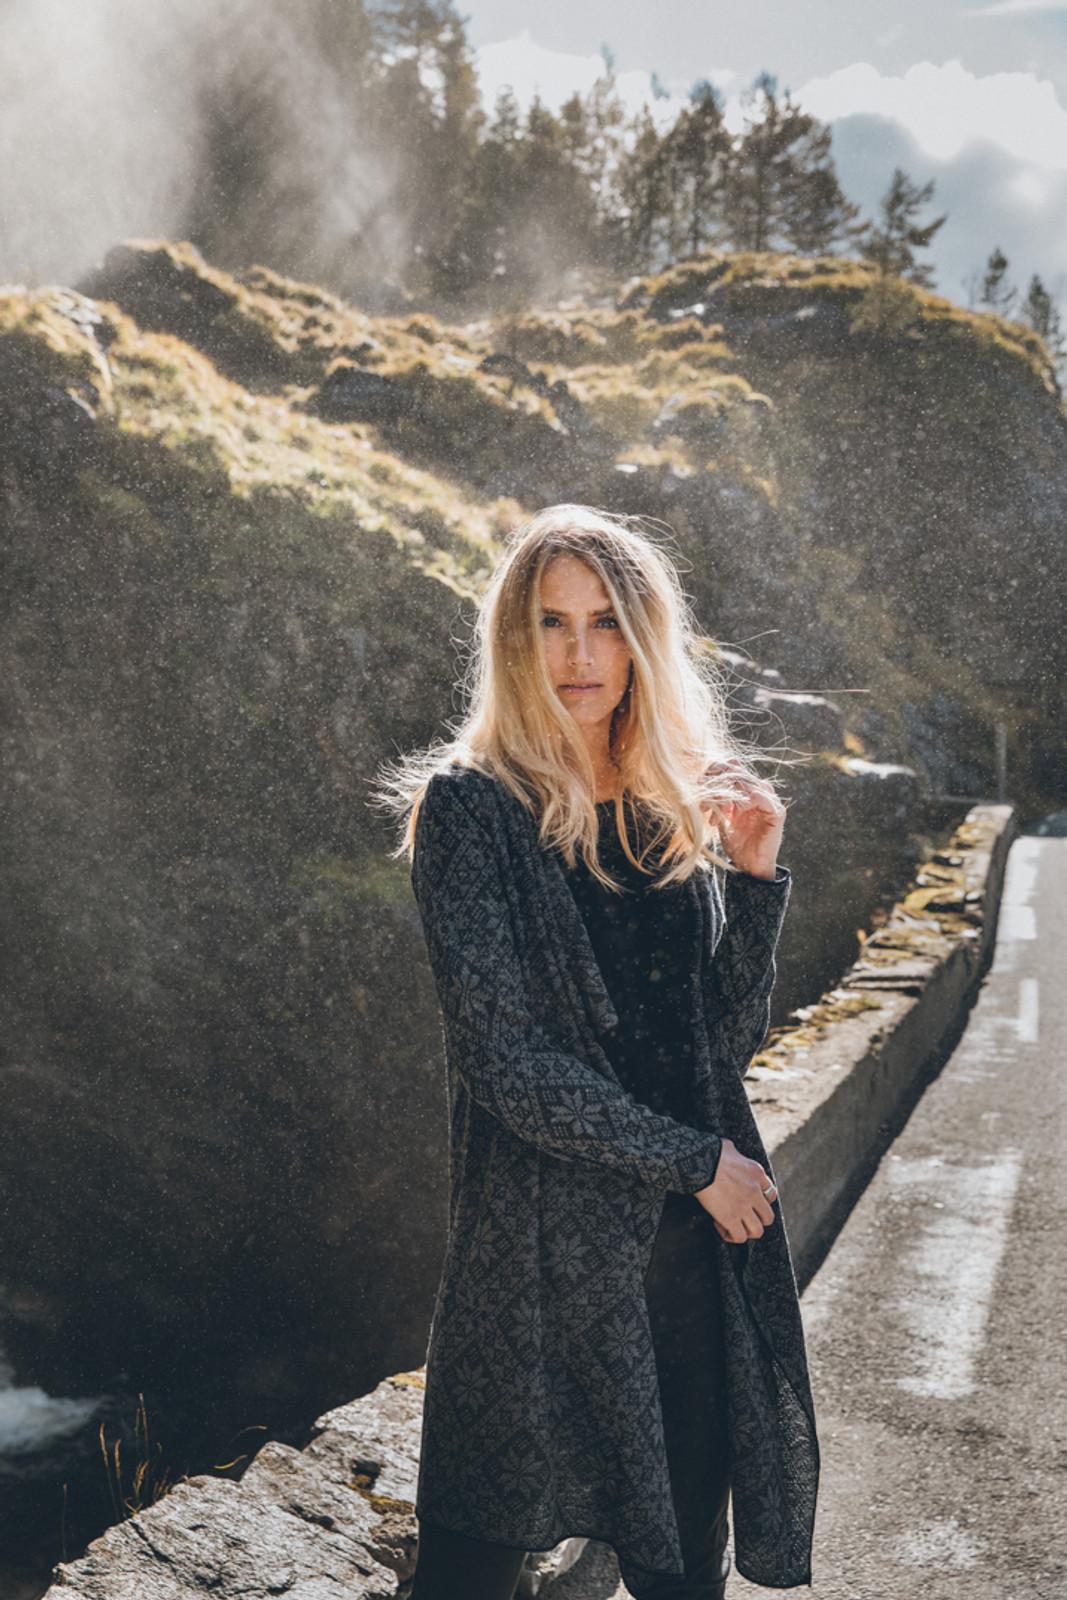 Woman by hillside wearing Dale of Norway's Flora Ladies Jacket in Black/Smoke, 83371-F